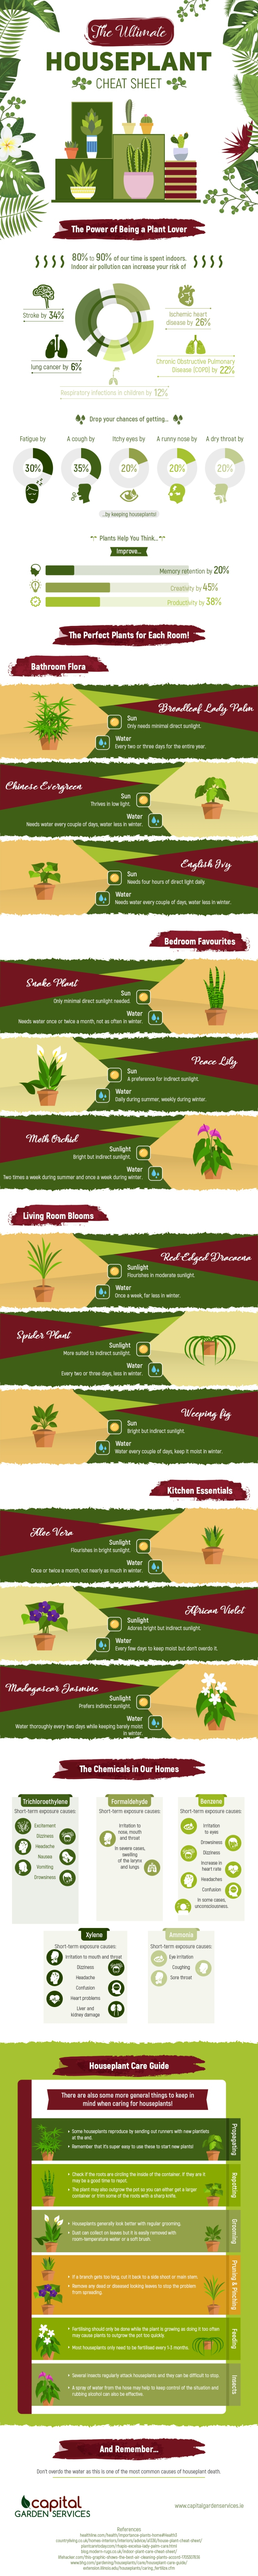 Houseplant Cheat Sheet [Infographic] | ecogreenlove